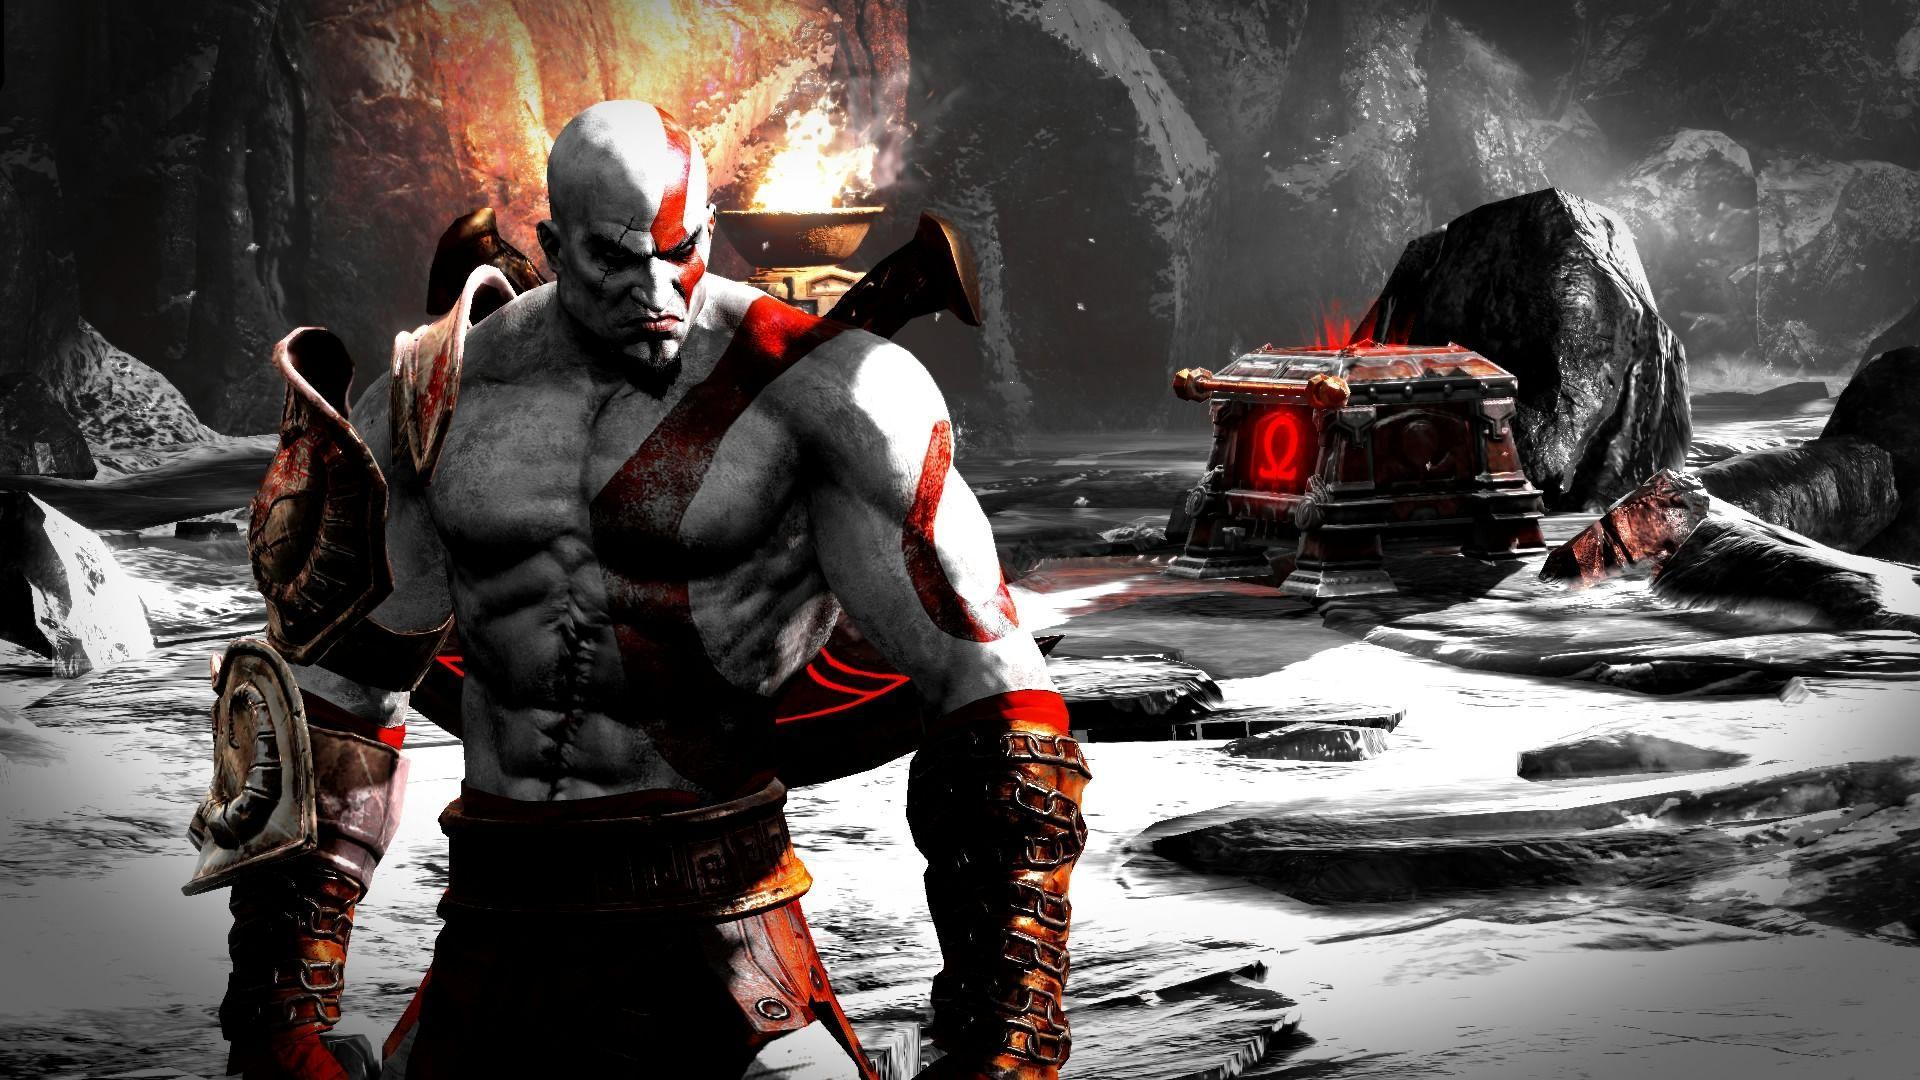 Free Download God Of War 3 Wallpapers | PixelsTalk.Net